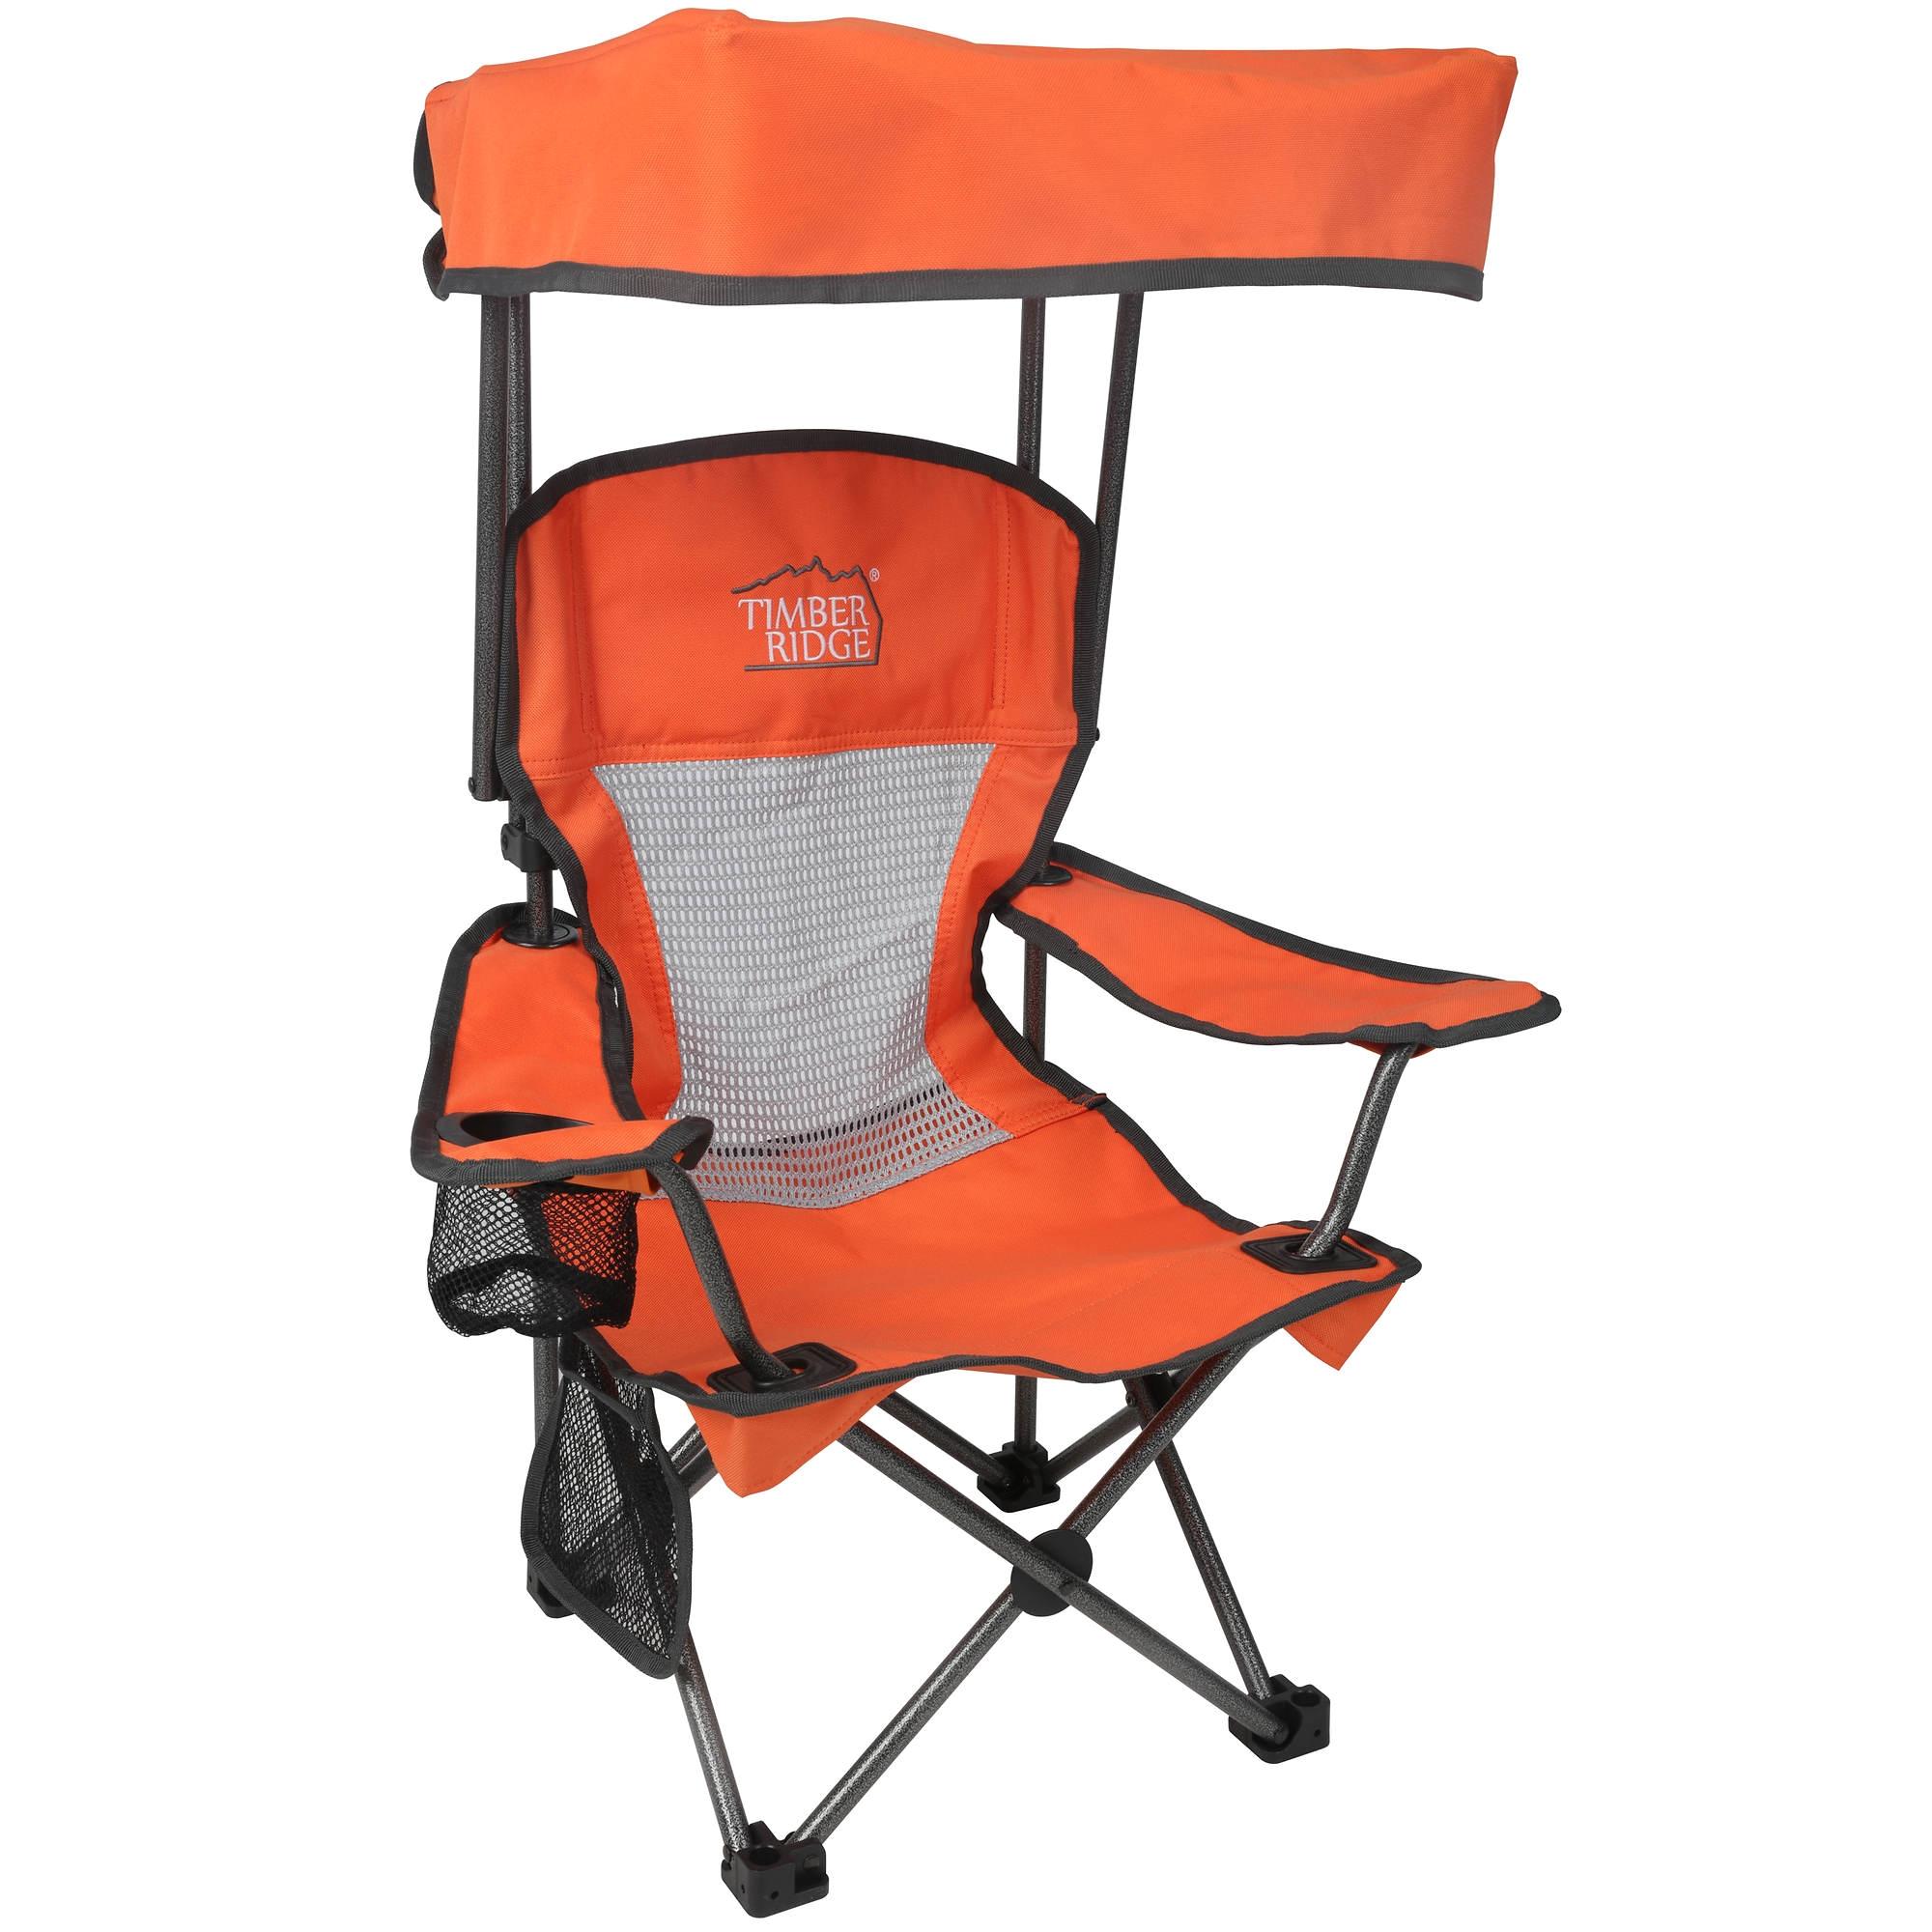 Timber Ridge Chairs Bjs Bjs wholesale Club Product